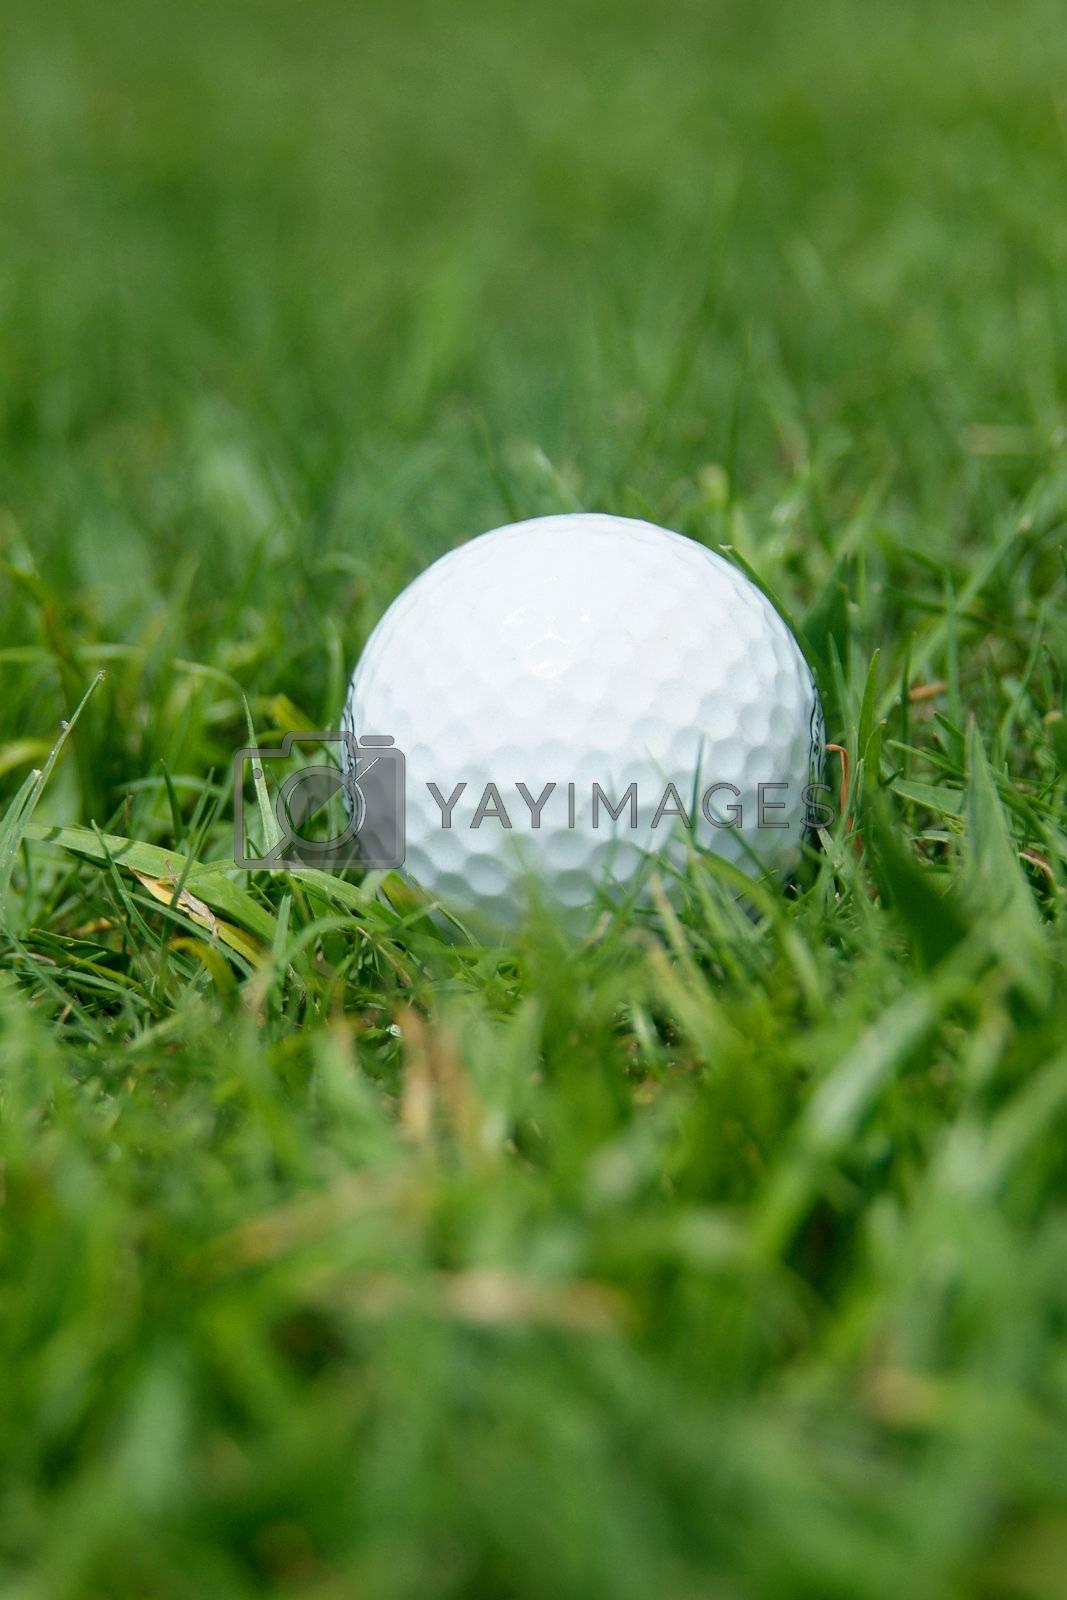 Golf-ball in the grass by epixx